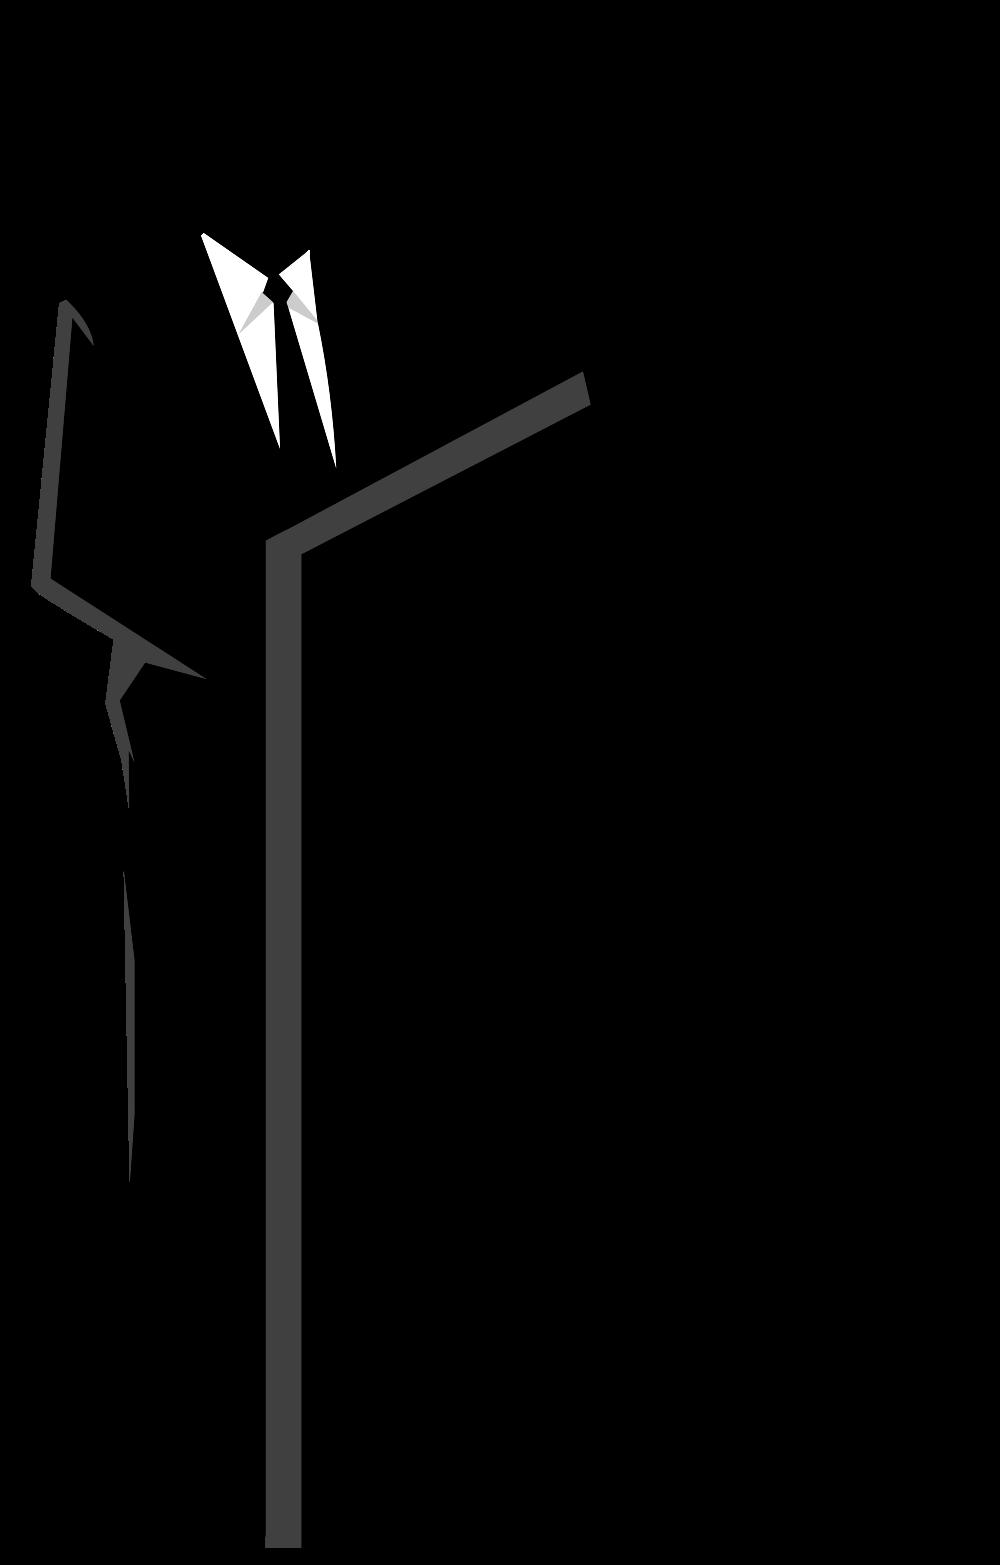 clip transparent stock File businessman silhouette svg. Podium clipart.